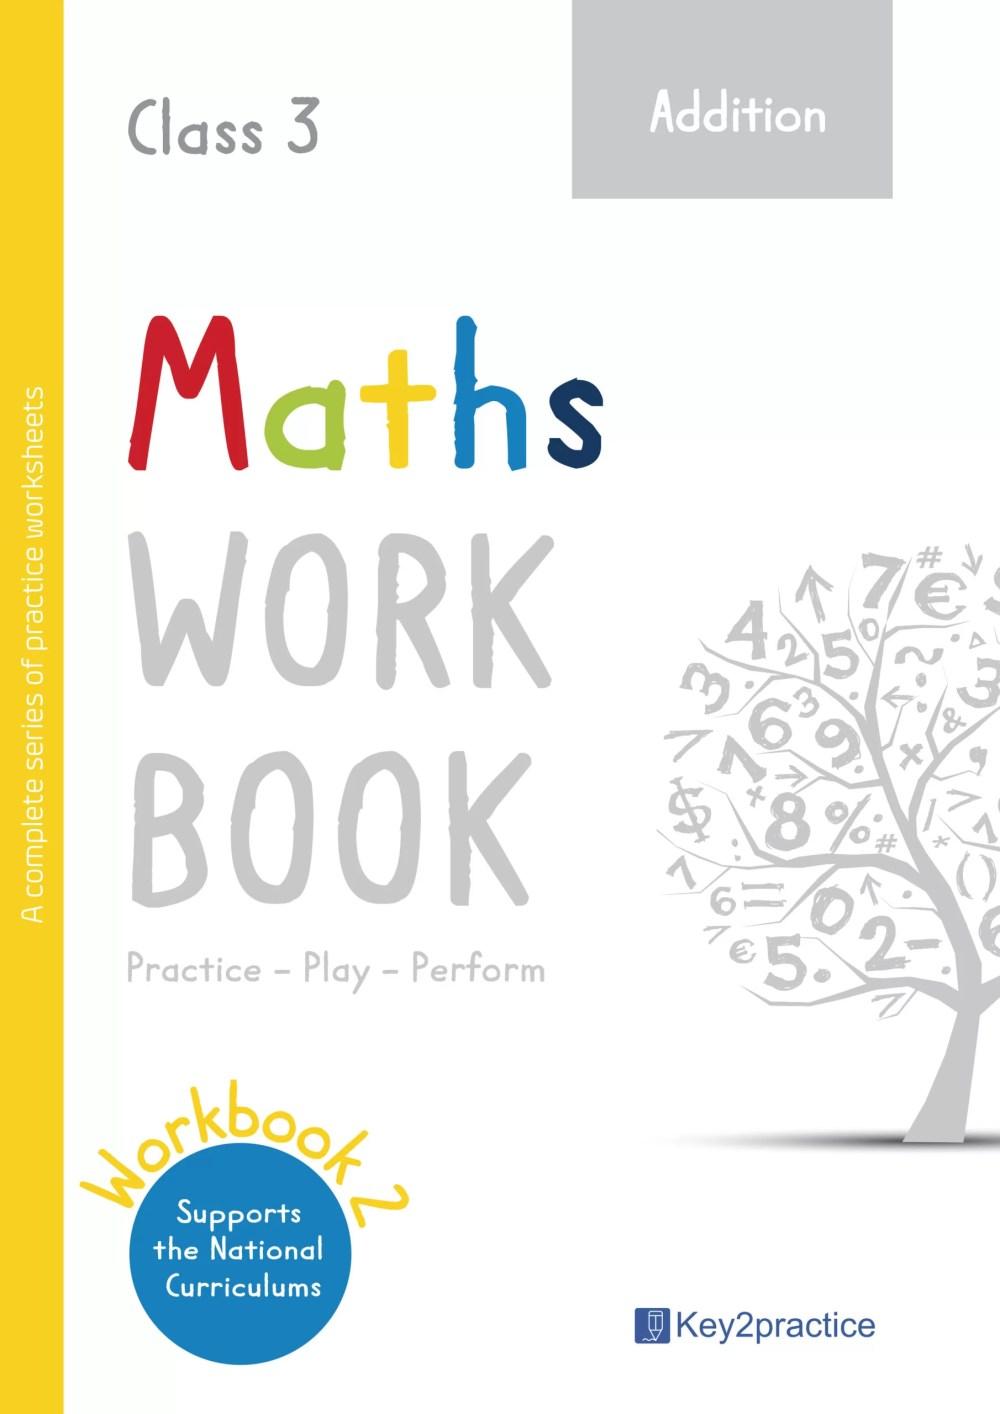 medium resolution of Grade 3 Addition Worksheets I Maths - key2practice Workbooks